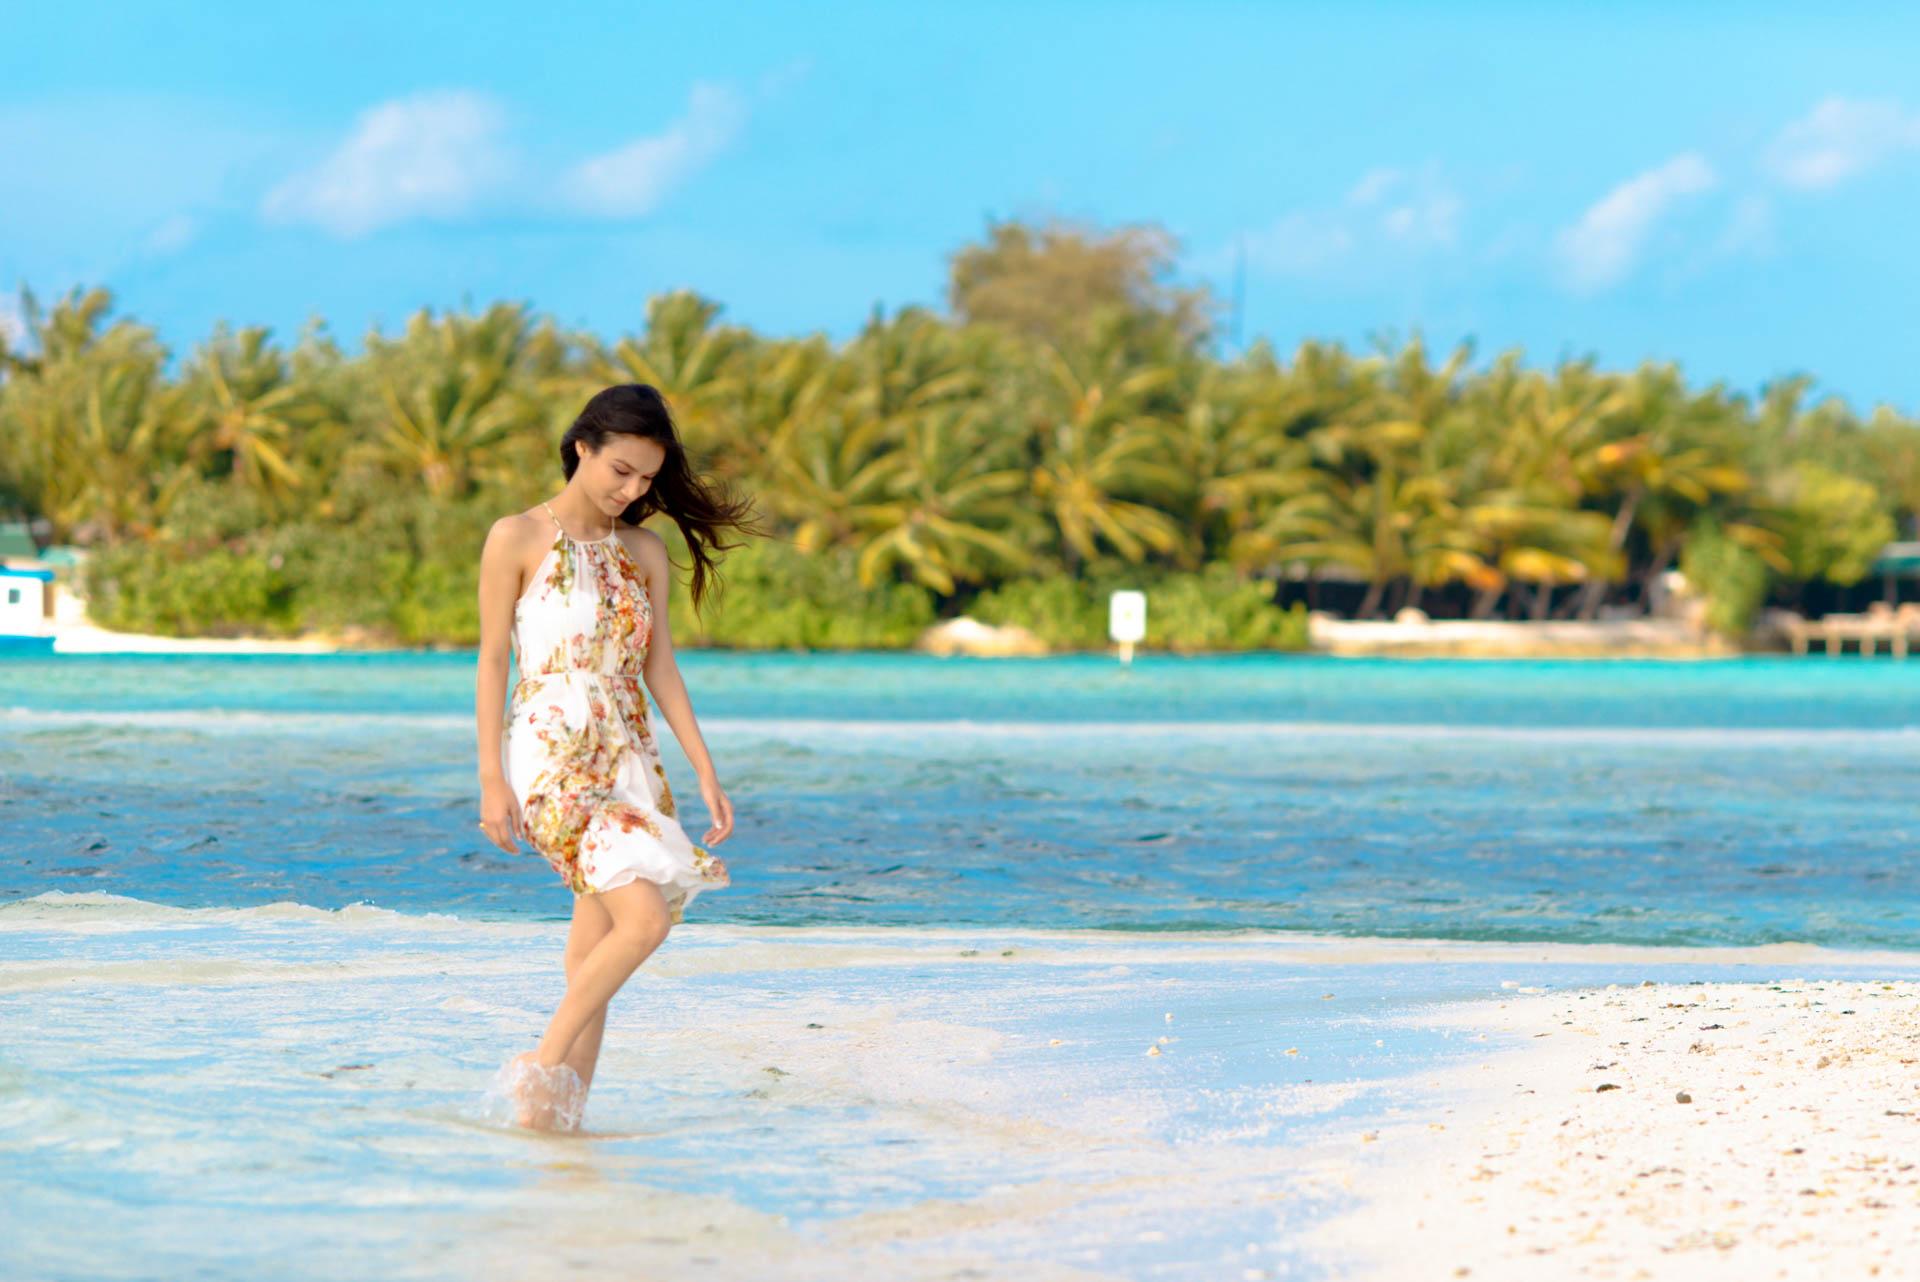 Abhijit Meghna Romantic Vacation in Maldives 19